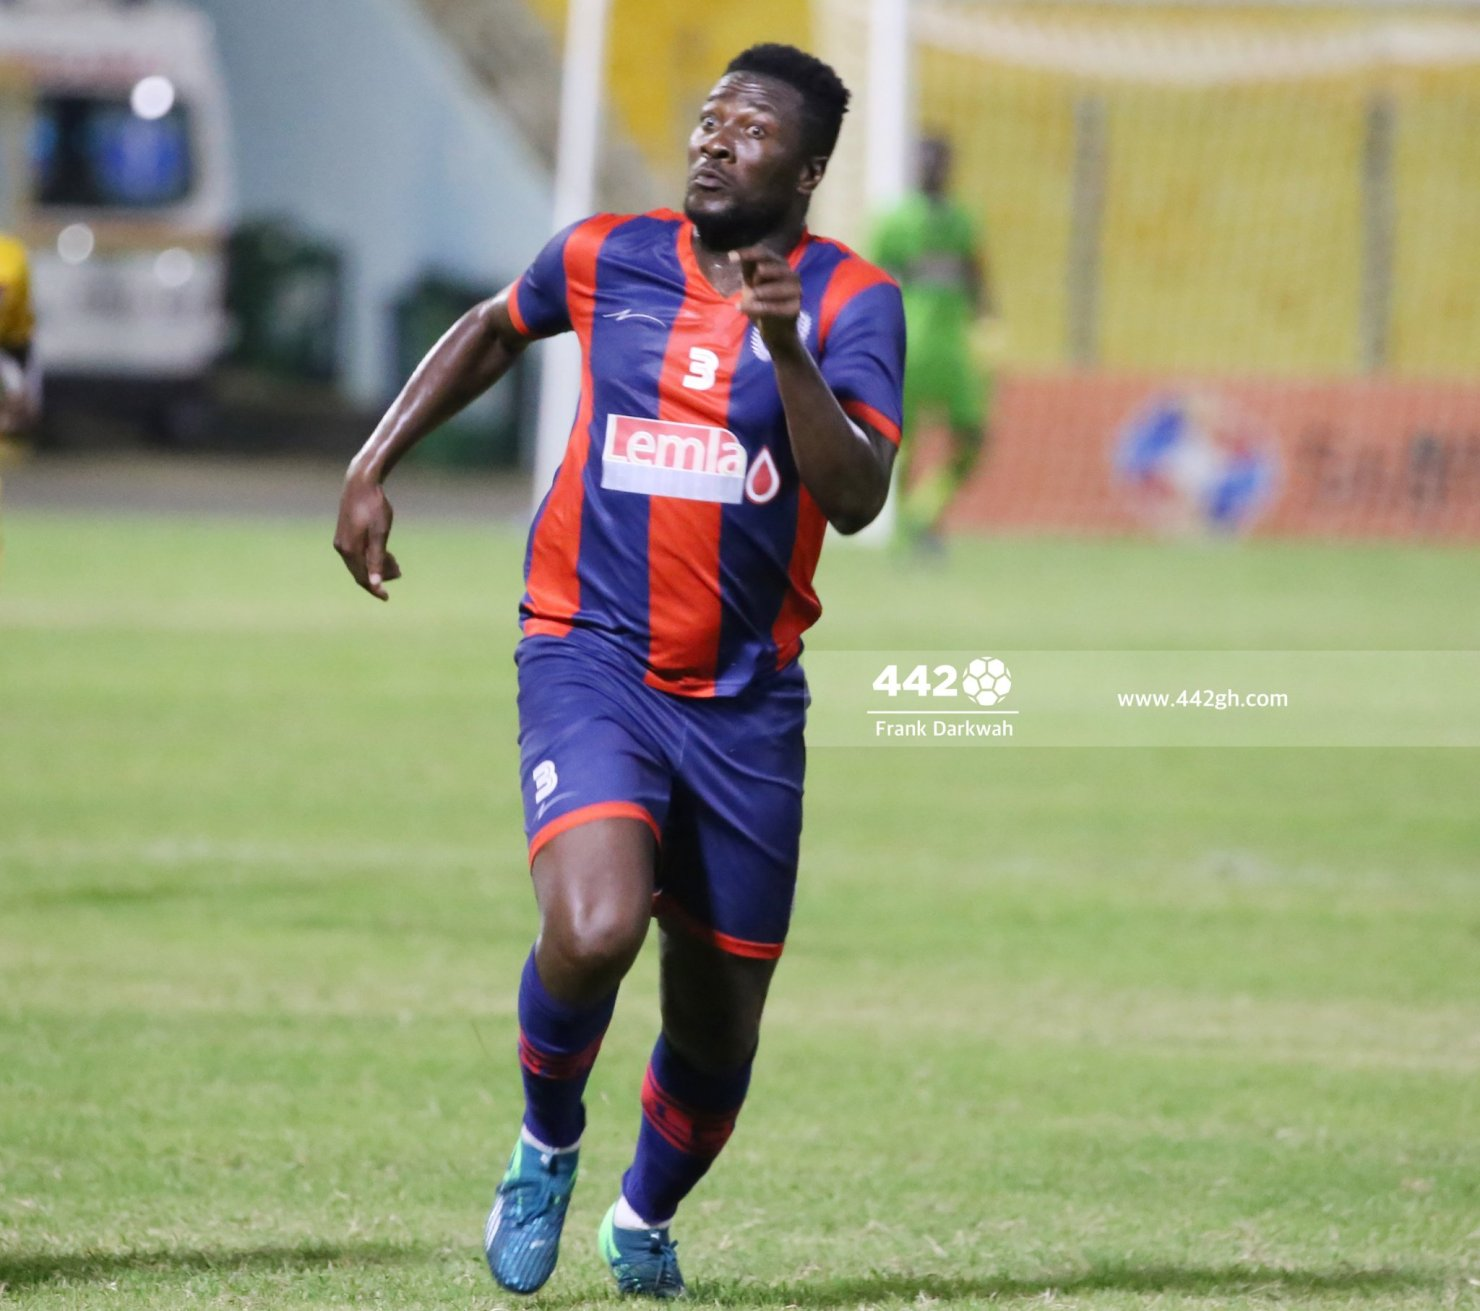 2021 Ghana Premier League: Legon Cities coach Hayford claims Asamoah Gyan's form is completely down